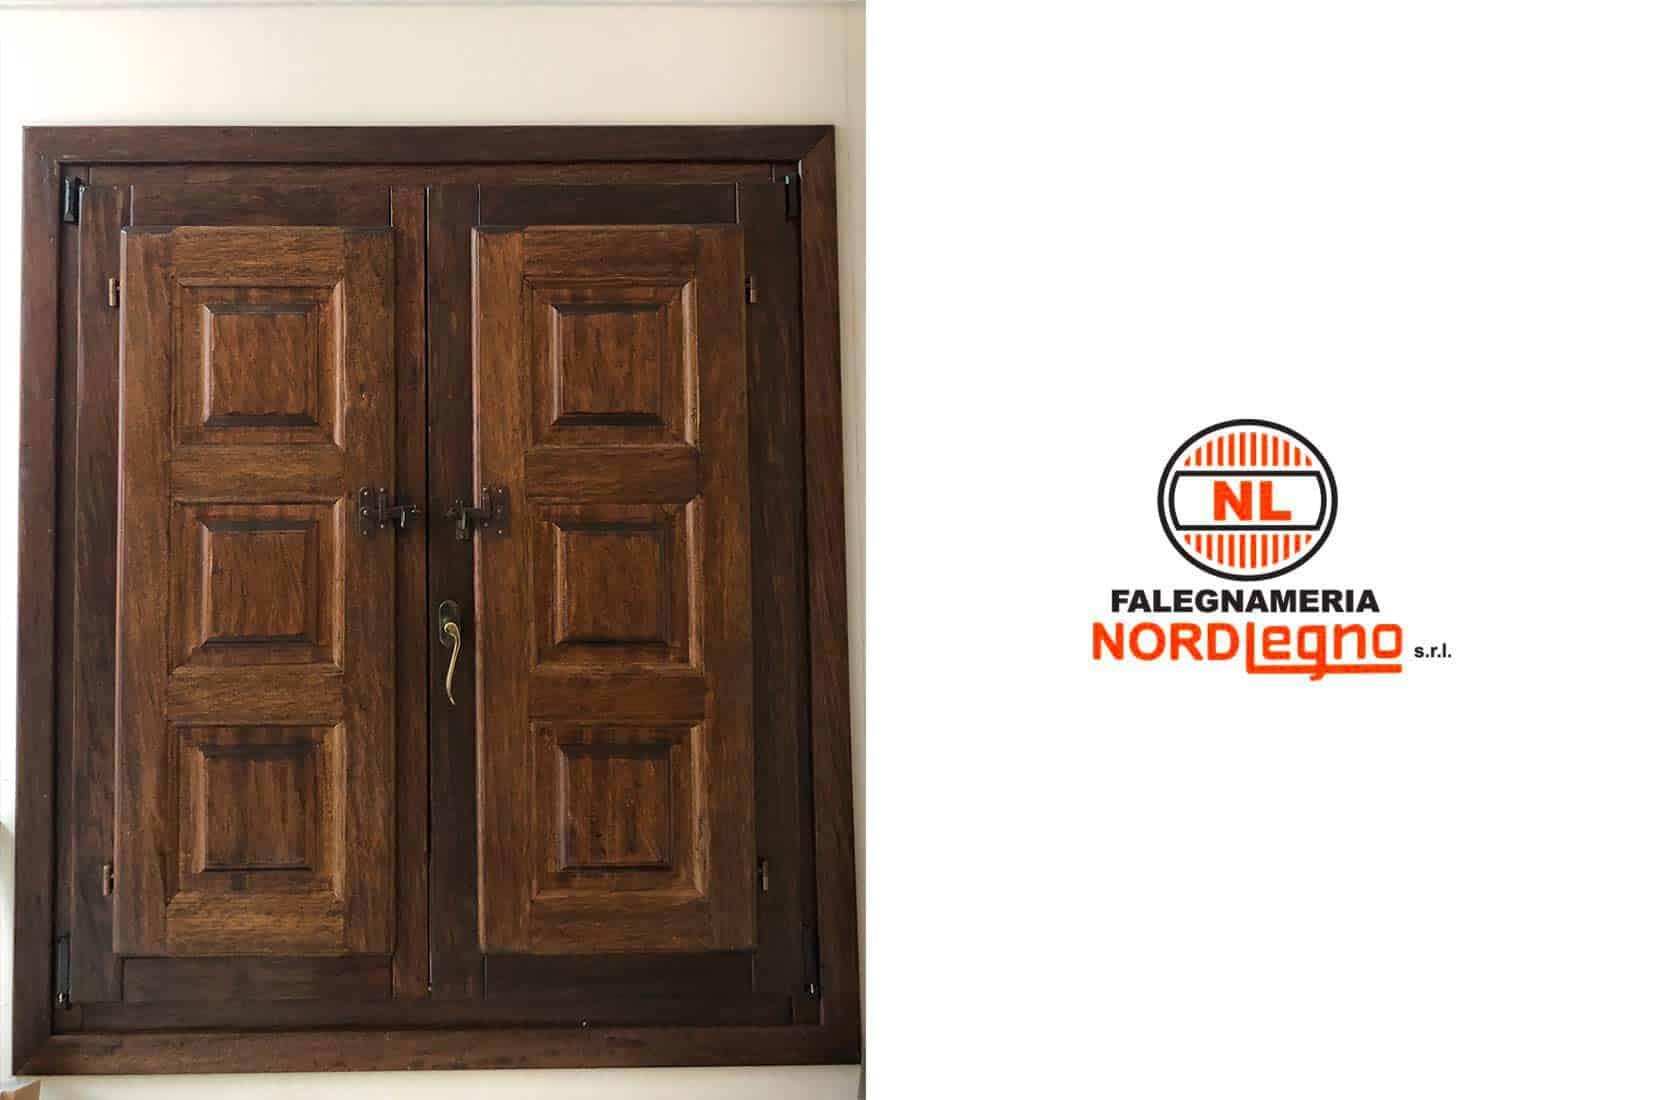 Falegnameria-calangianus-nord-legno-infissi-esterni-balcone-legno2.jpg